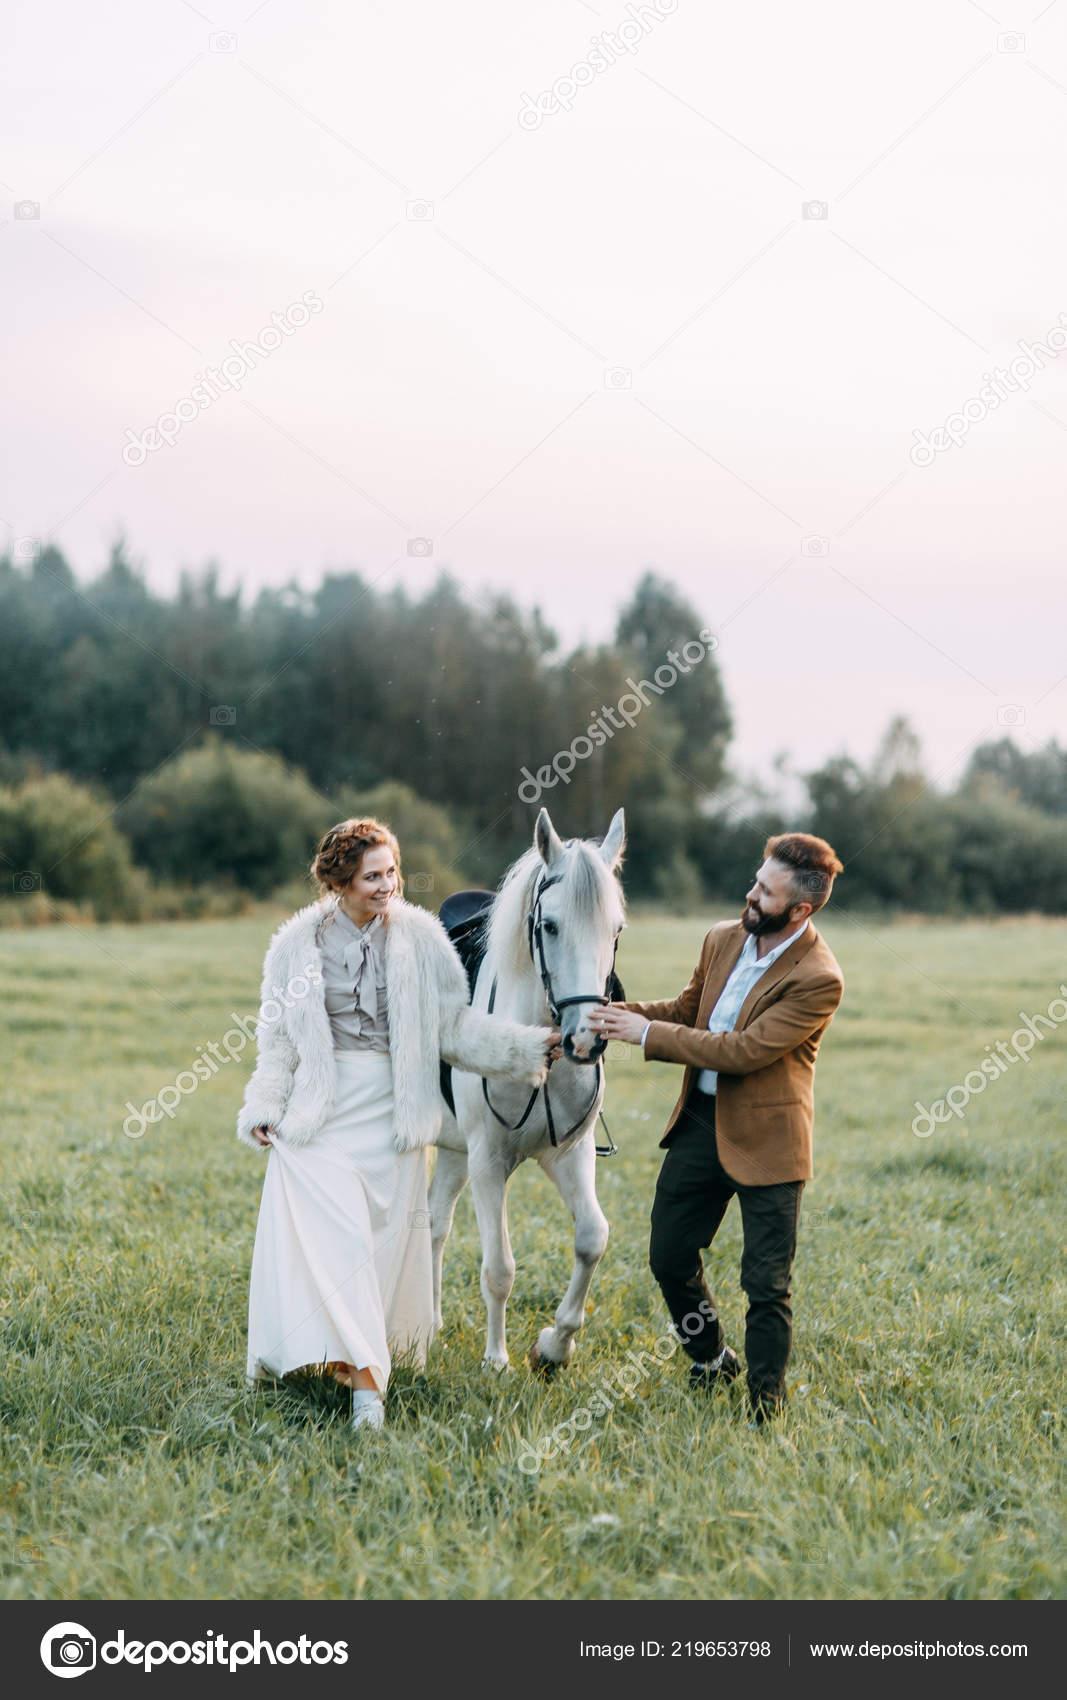 Wedding American Style Ranch Horse Walk Couples Fields Sunset Friends Stock Photo C Pavelvozmischev 219653798